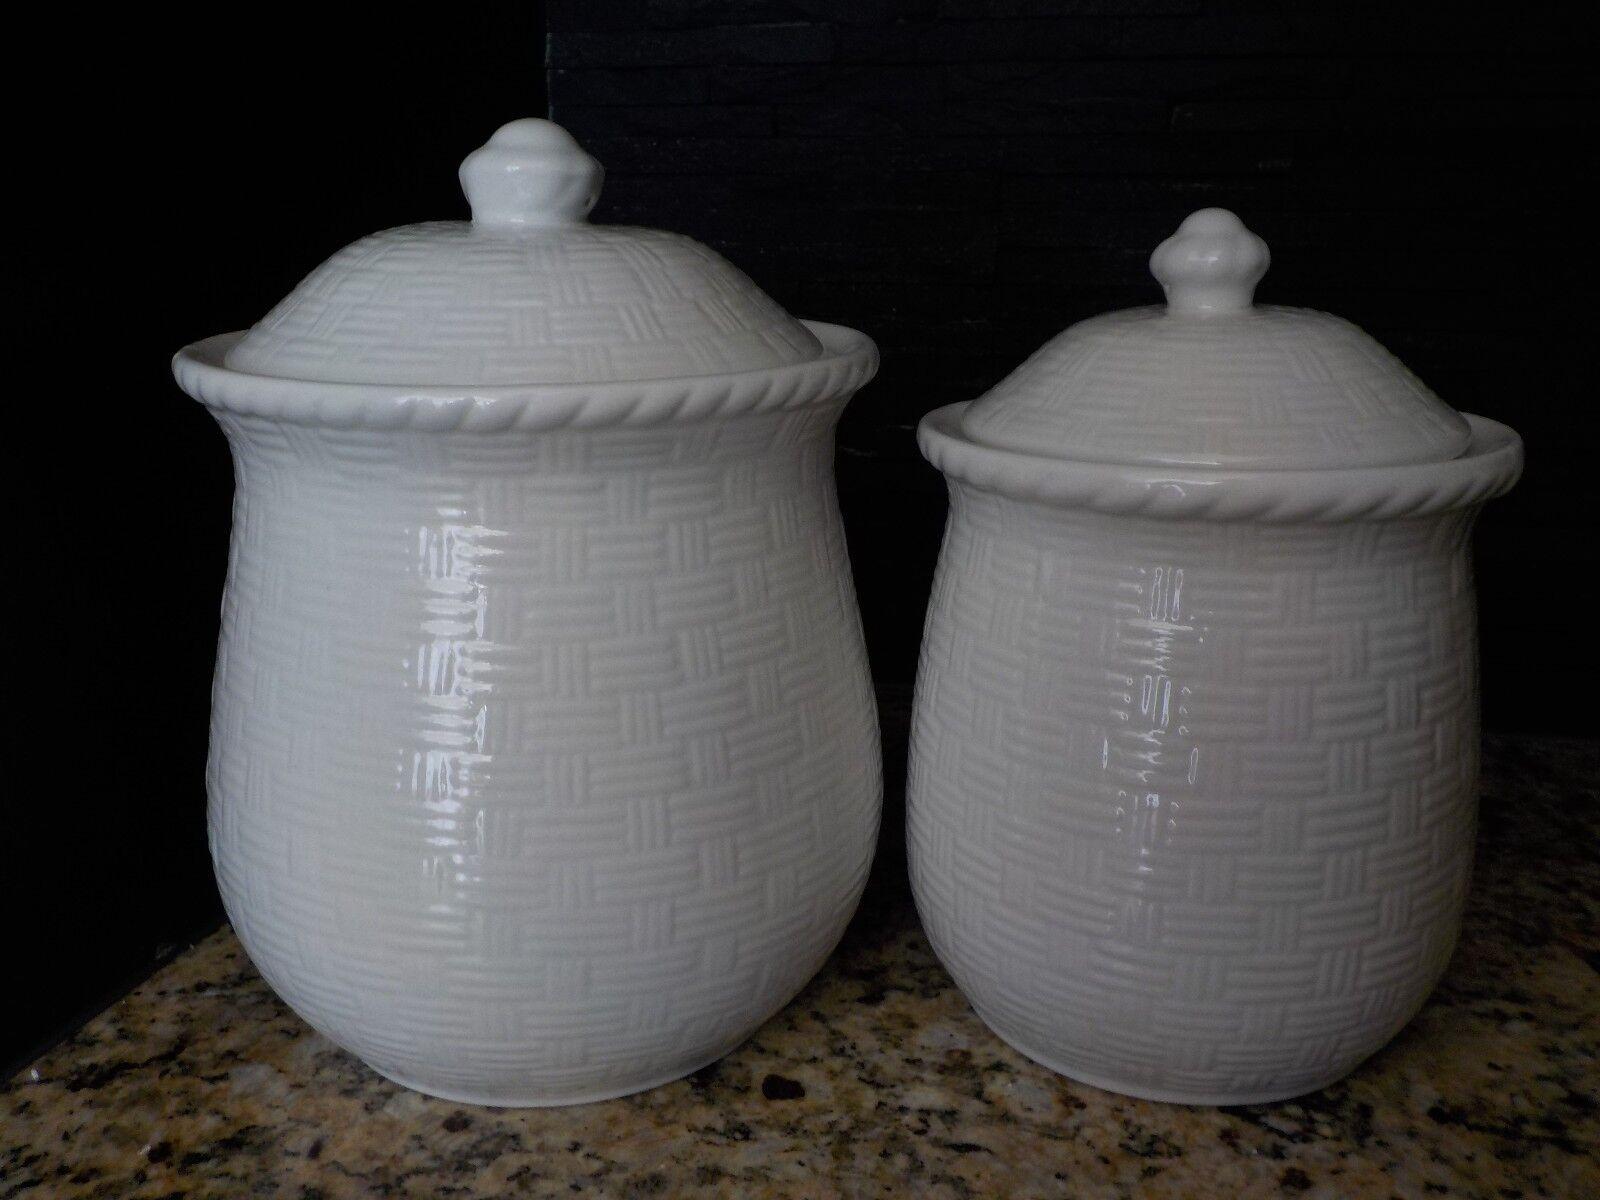 Ophelia Co Modern Ceramic 2 Piece Kitchen Canister Set Set Of 2 For Sale Online Ebay